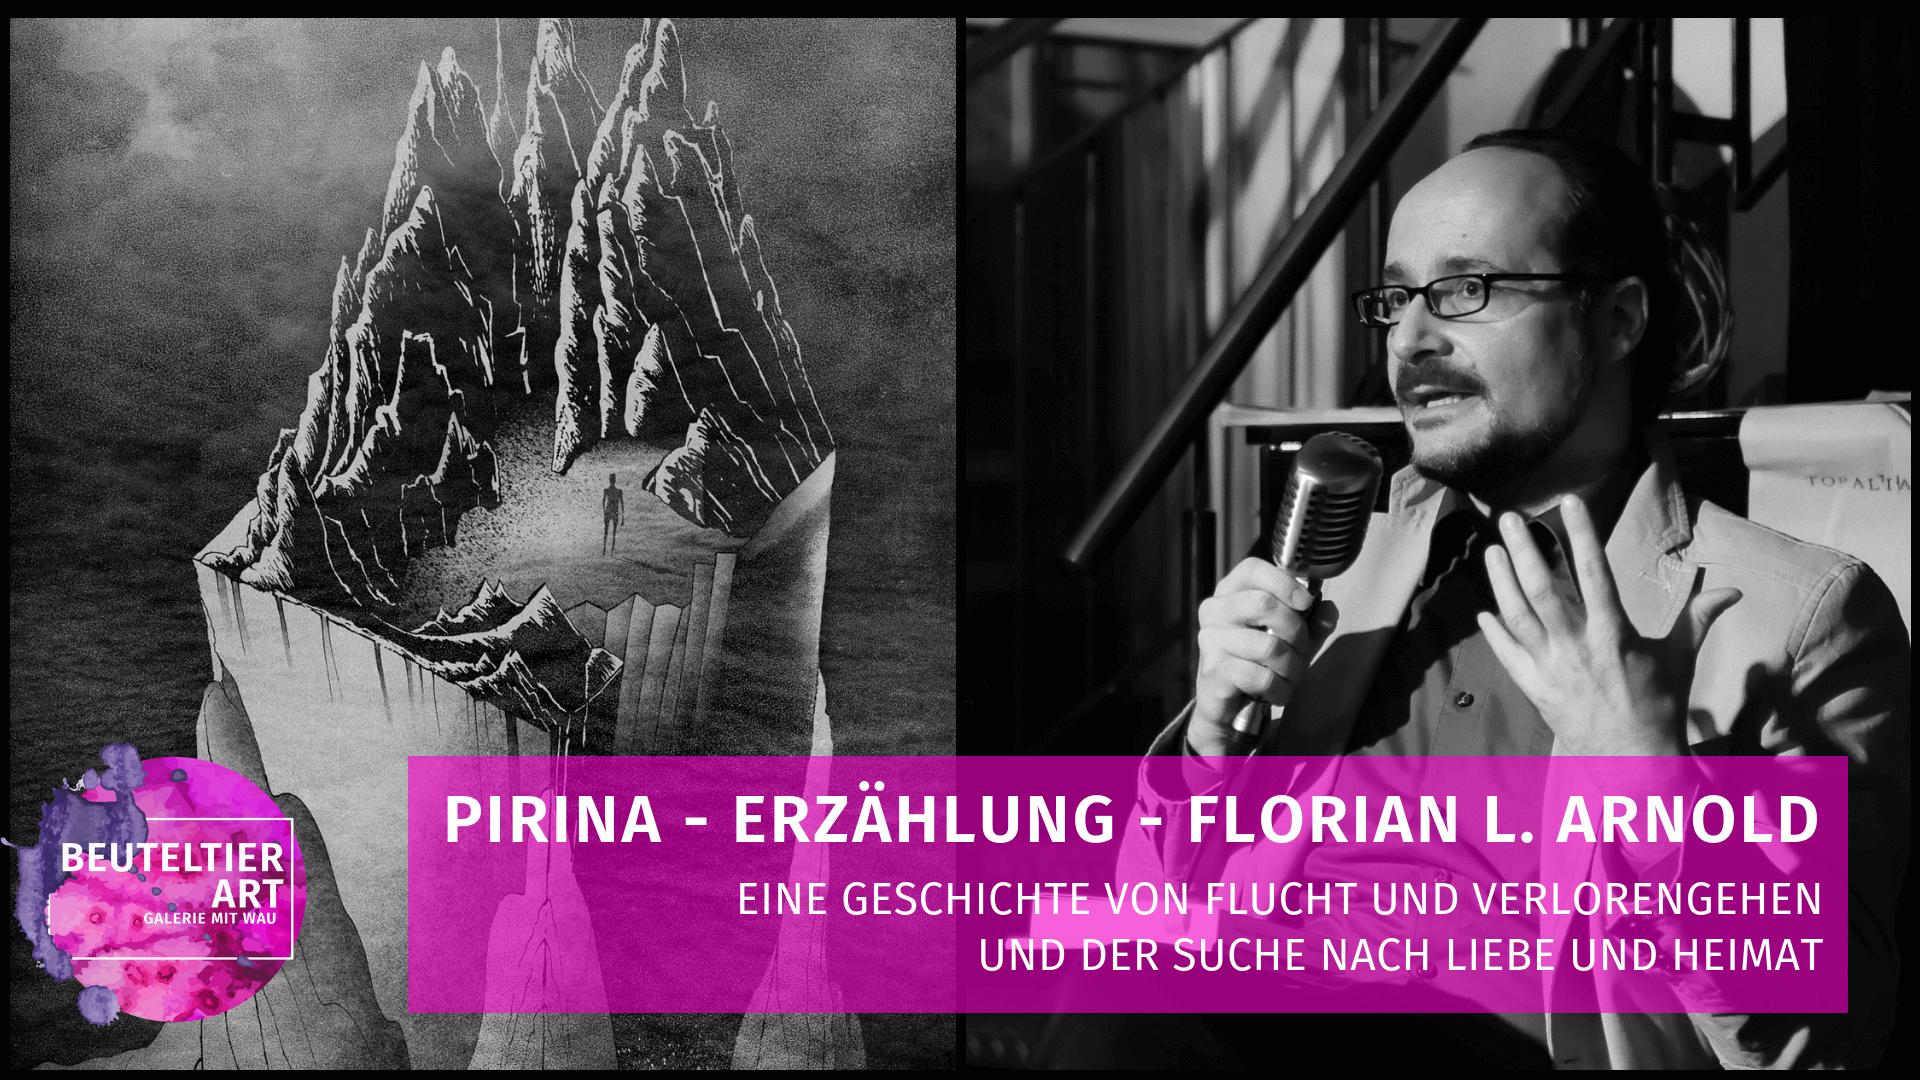 Pirina - Lesung von Autor Florian L. Arnold